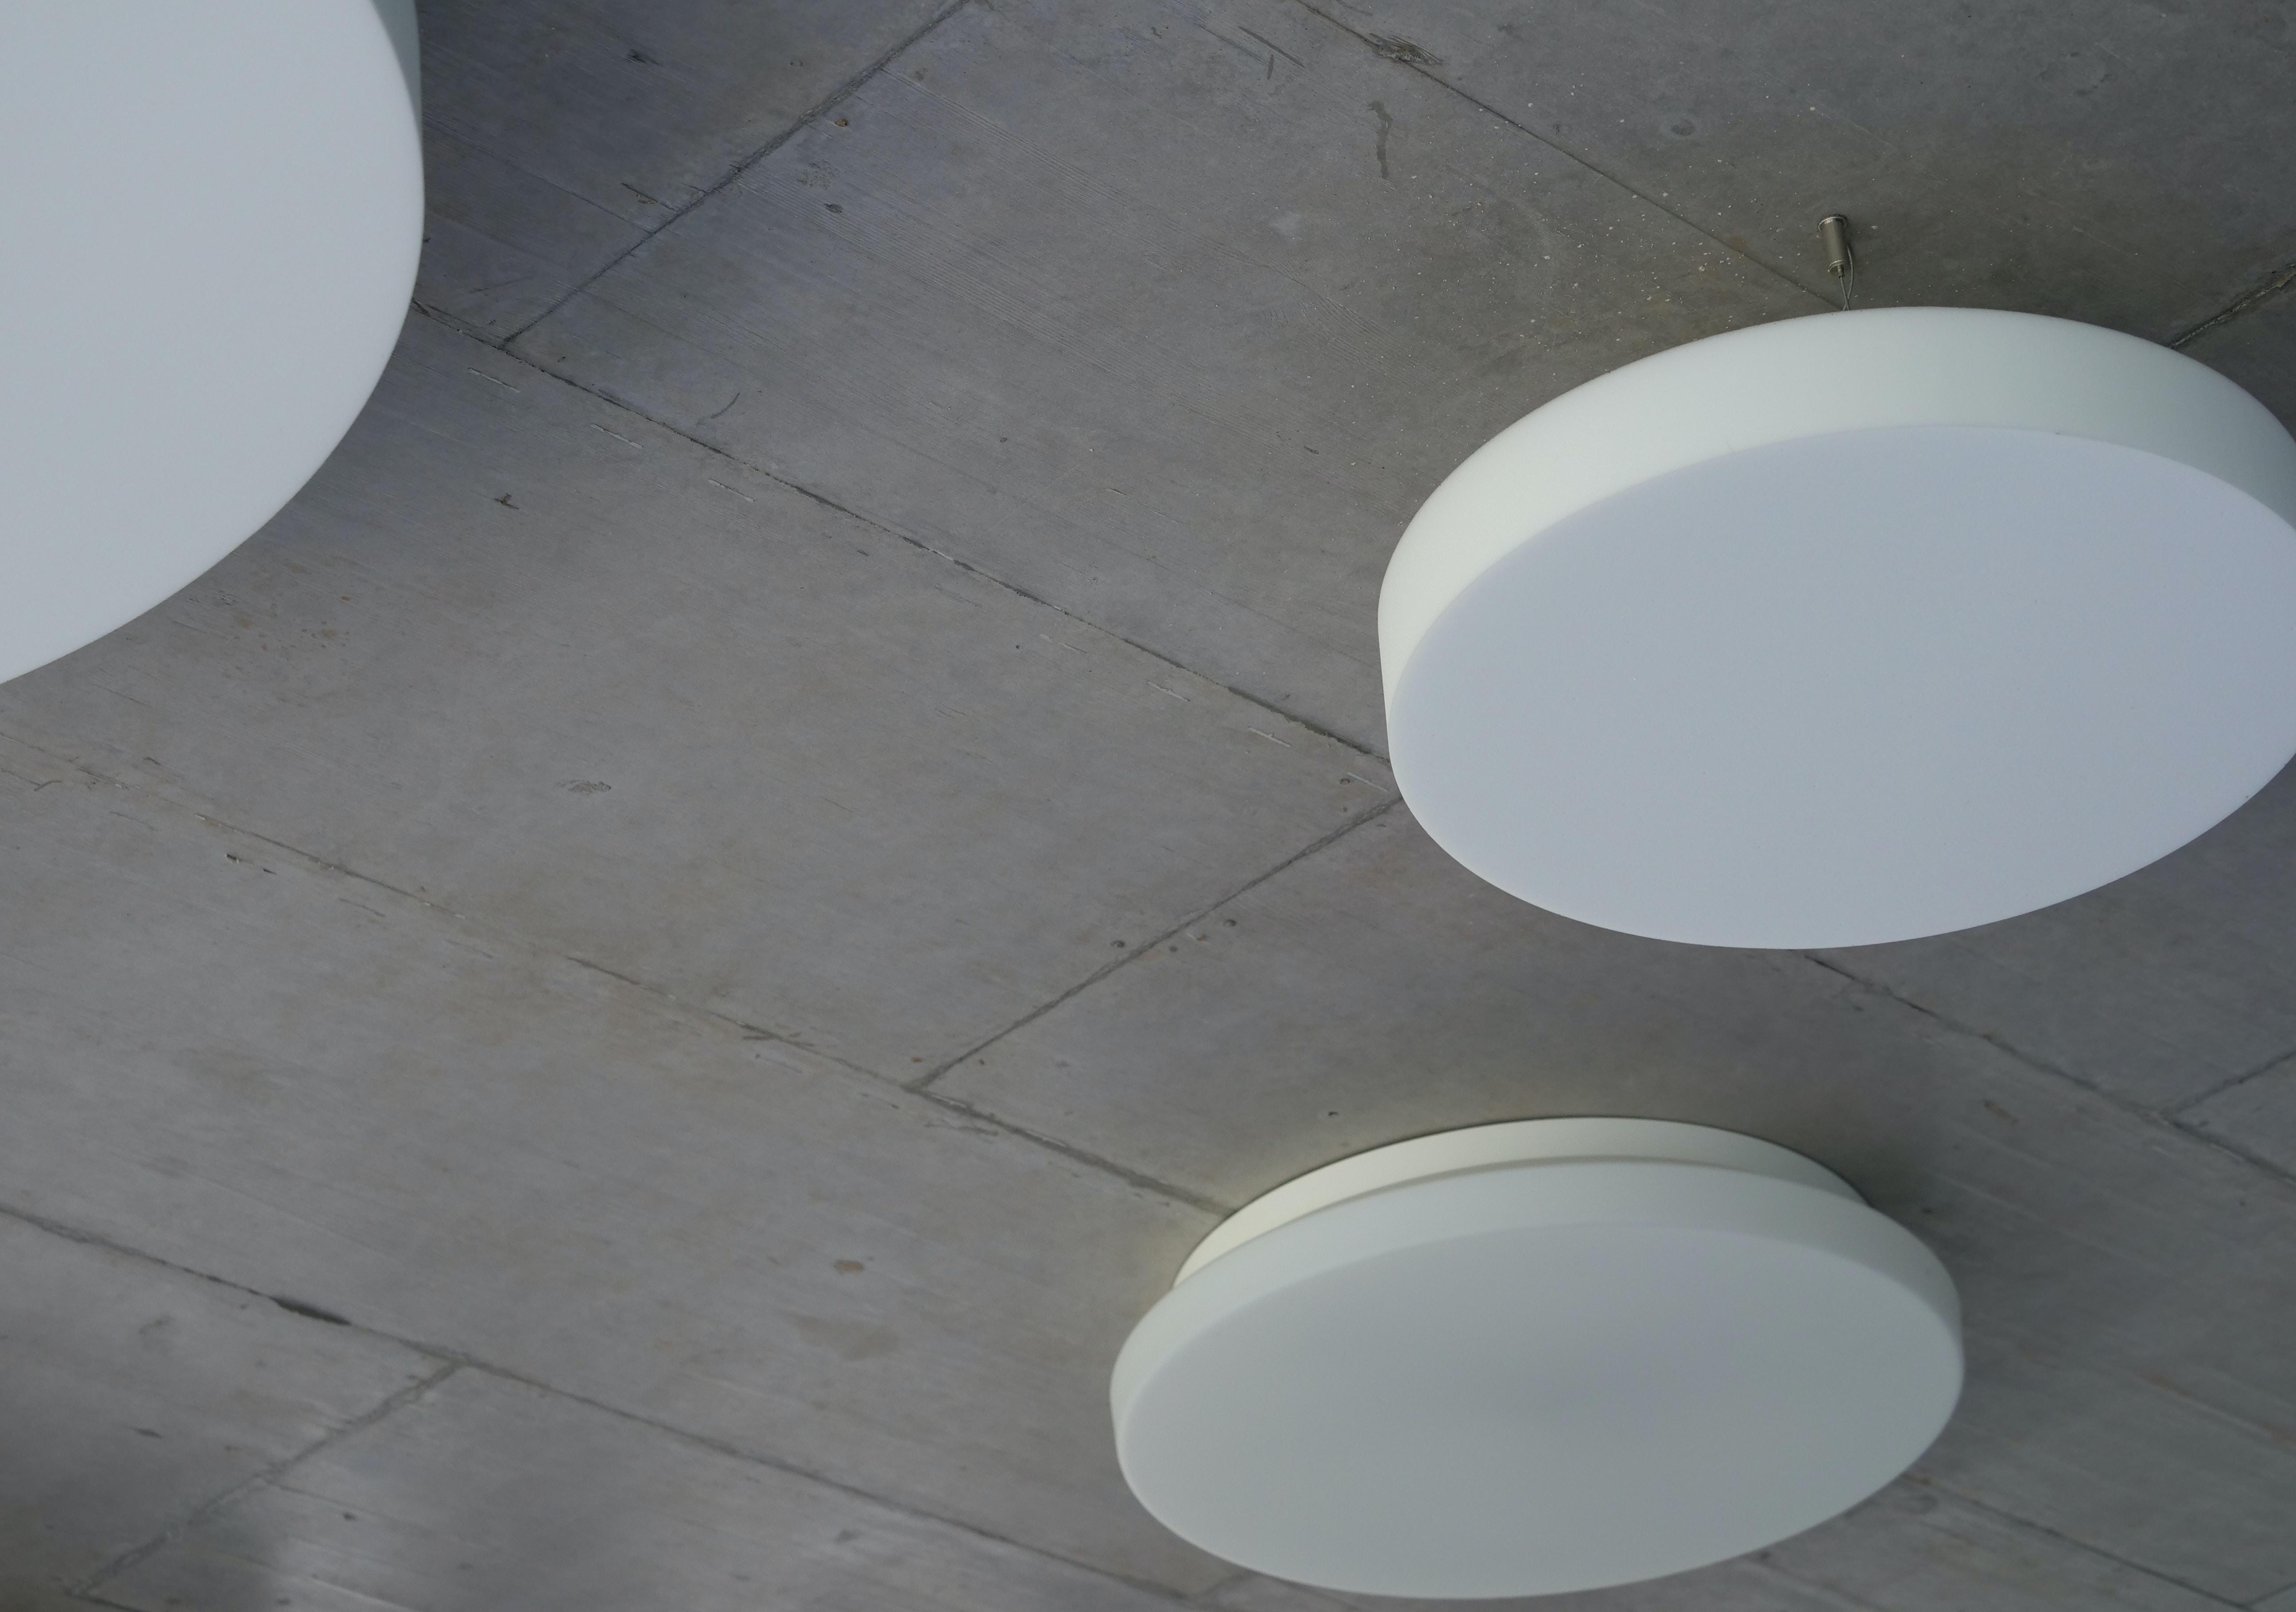 two round white plates on floor